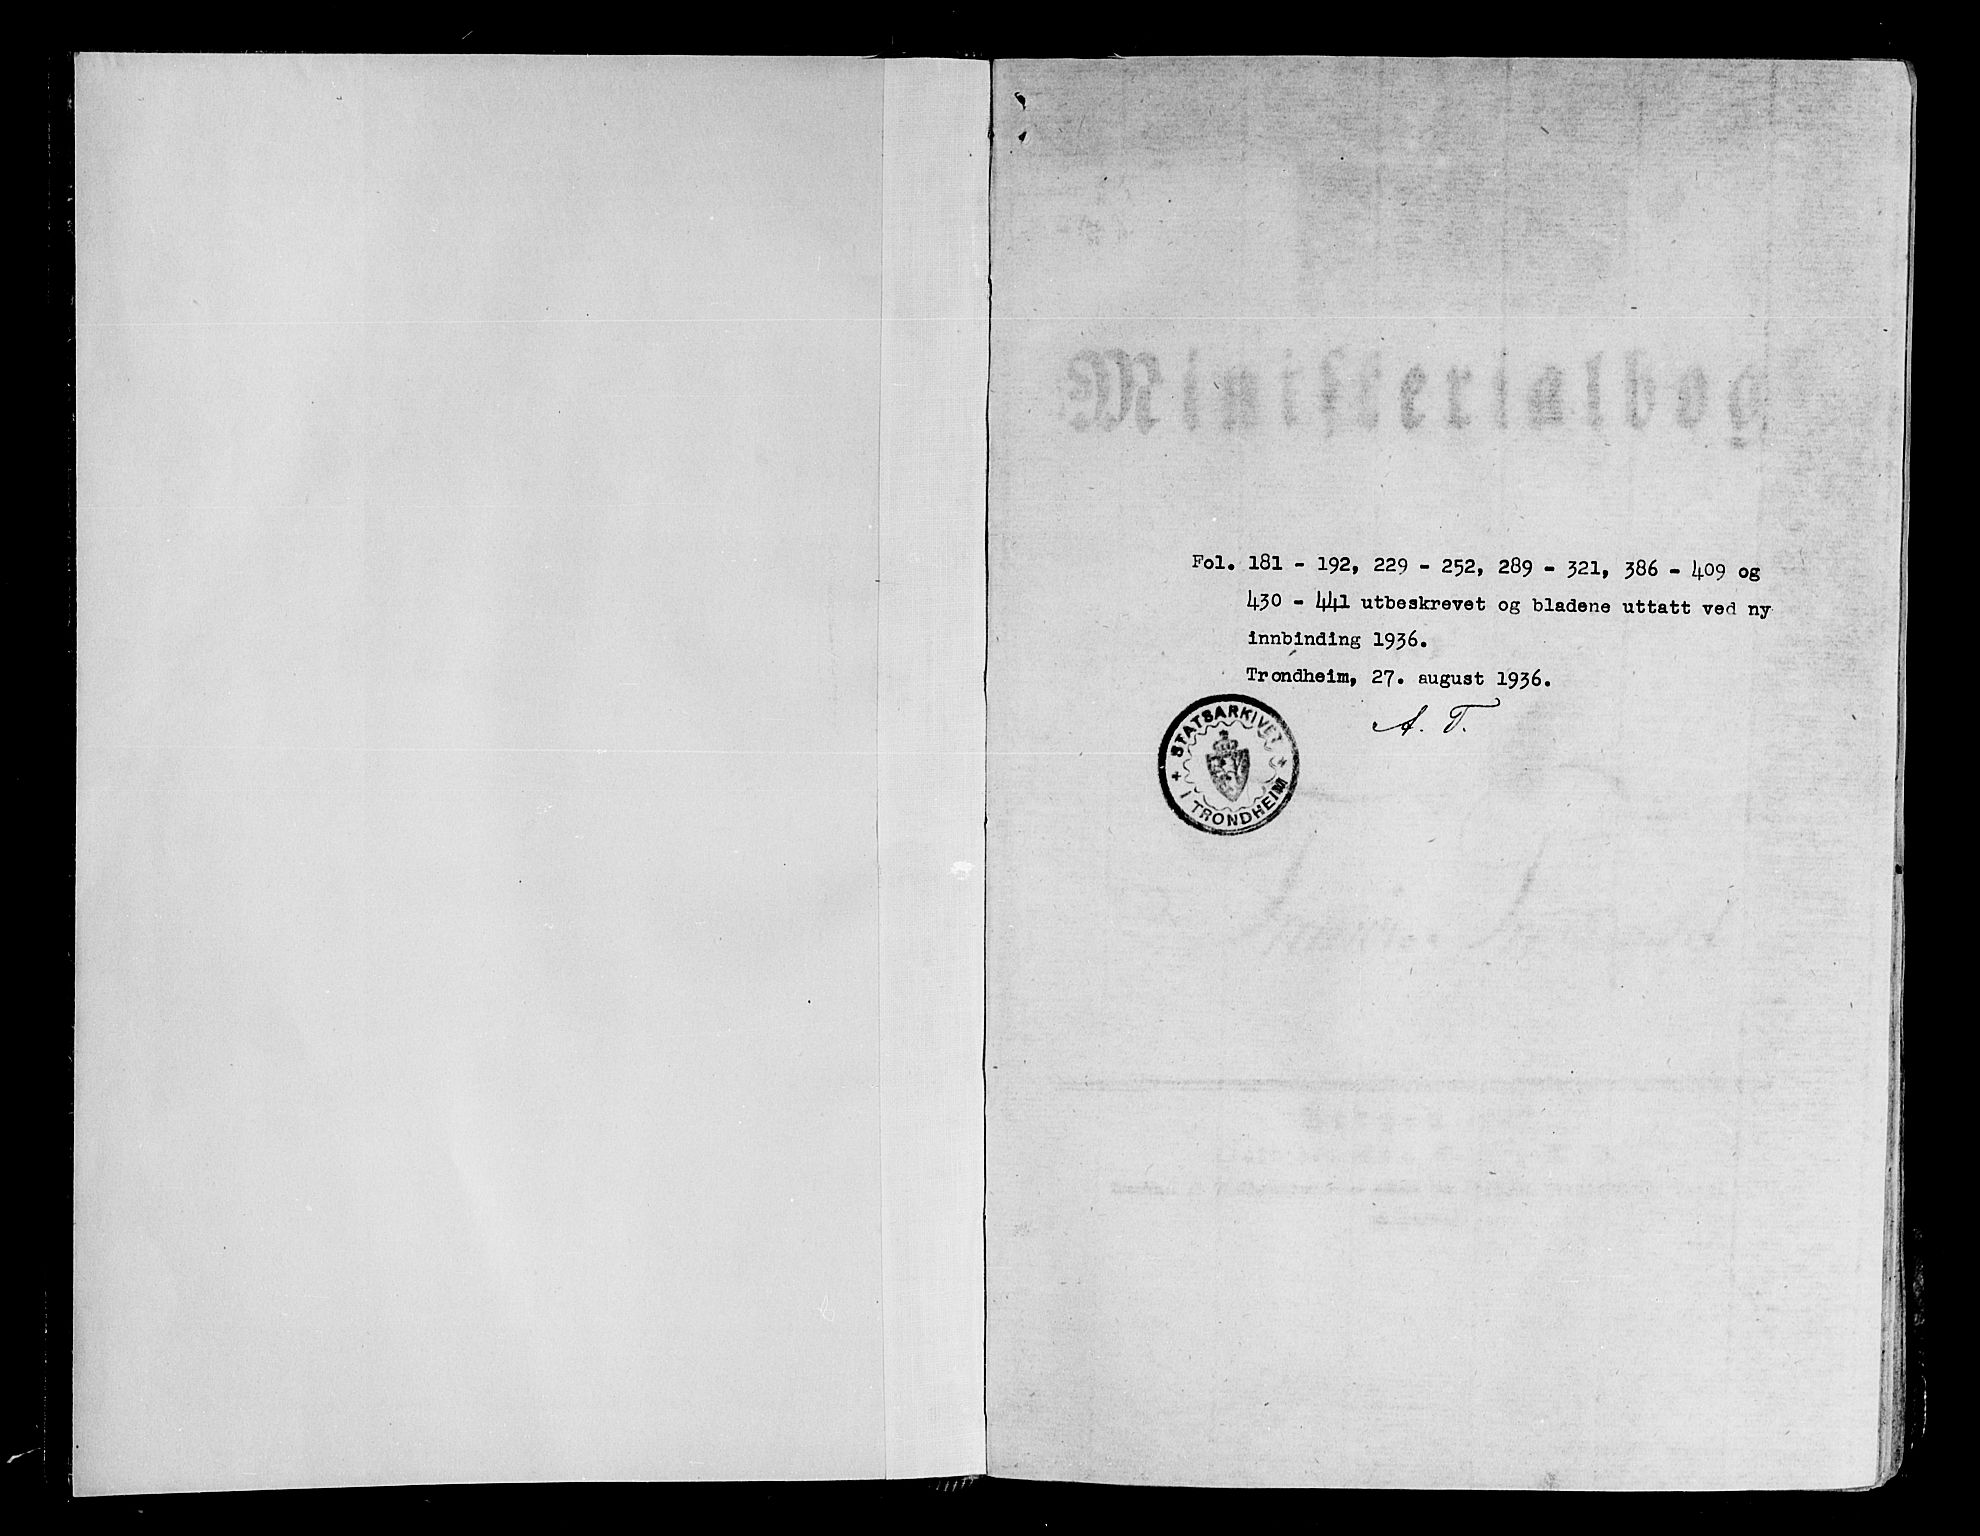 SATØ, Tranøy sokneprestkontor, I/Ia/Iaa/L0005kirke: Ministerialbok nr. 5, 1829-1844